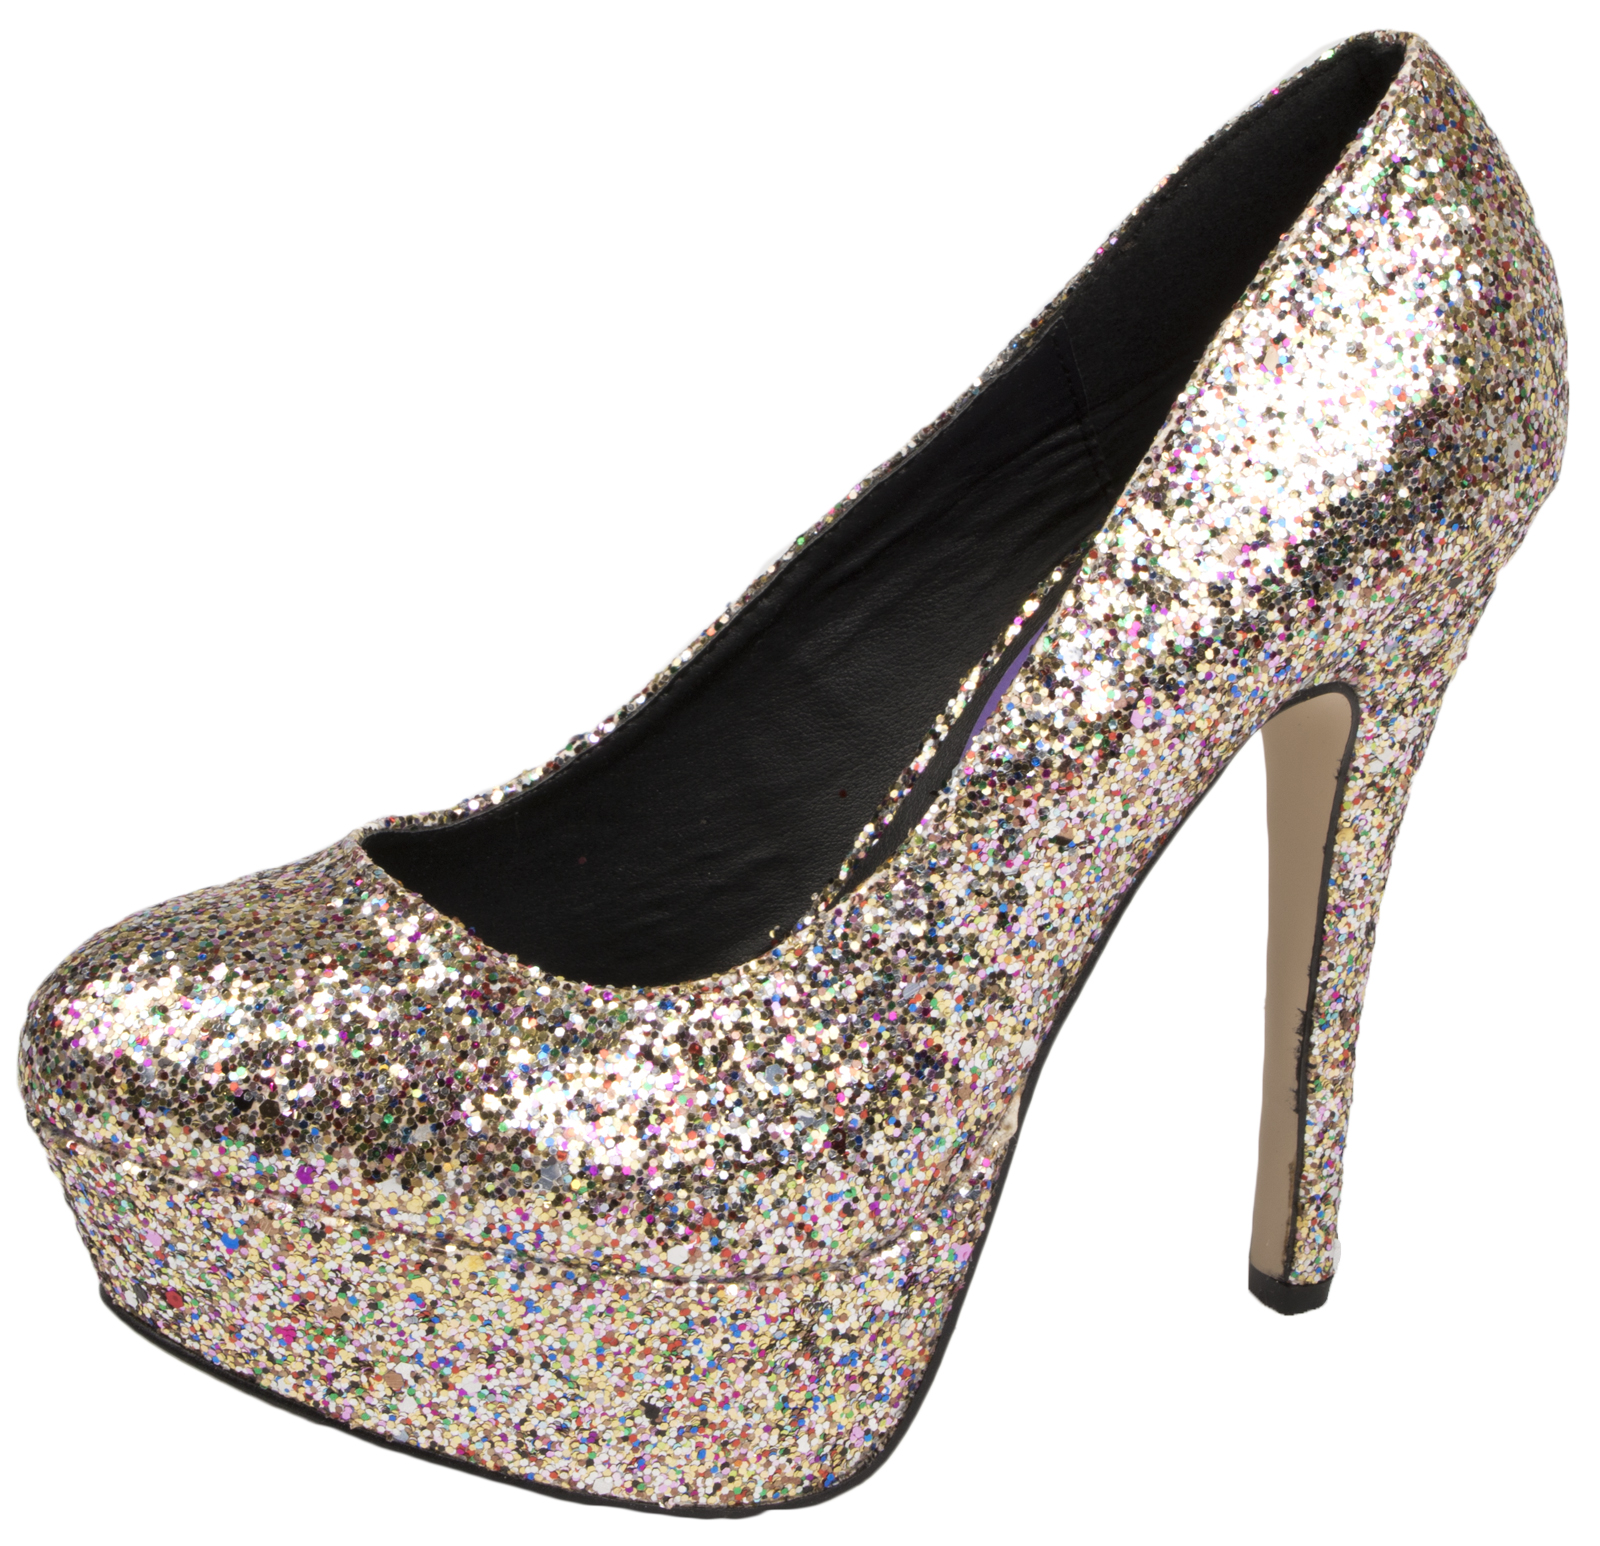 d9f663e1dc6 Womens Glitter High Heels Stiletto Party Shoes Platforms Court Shoes ...